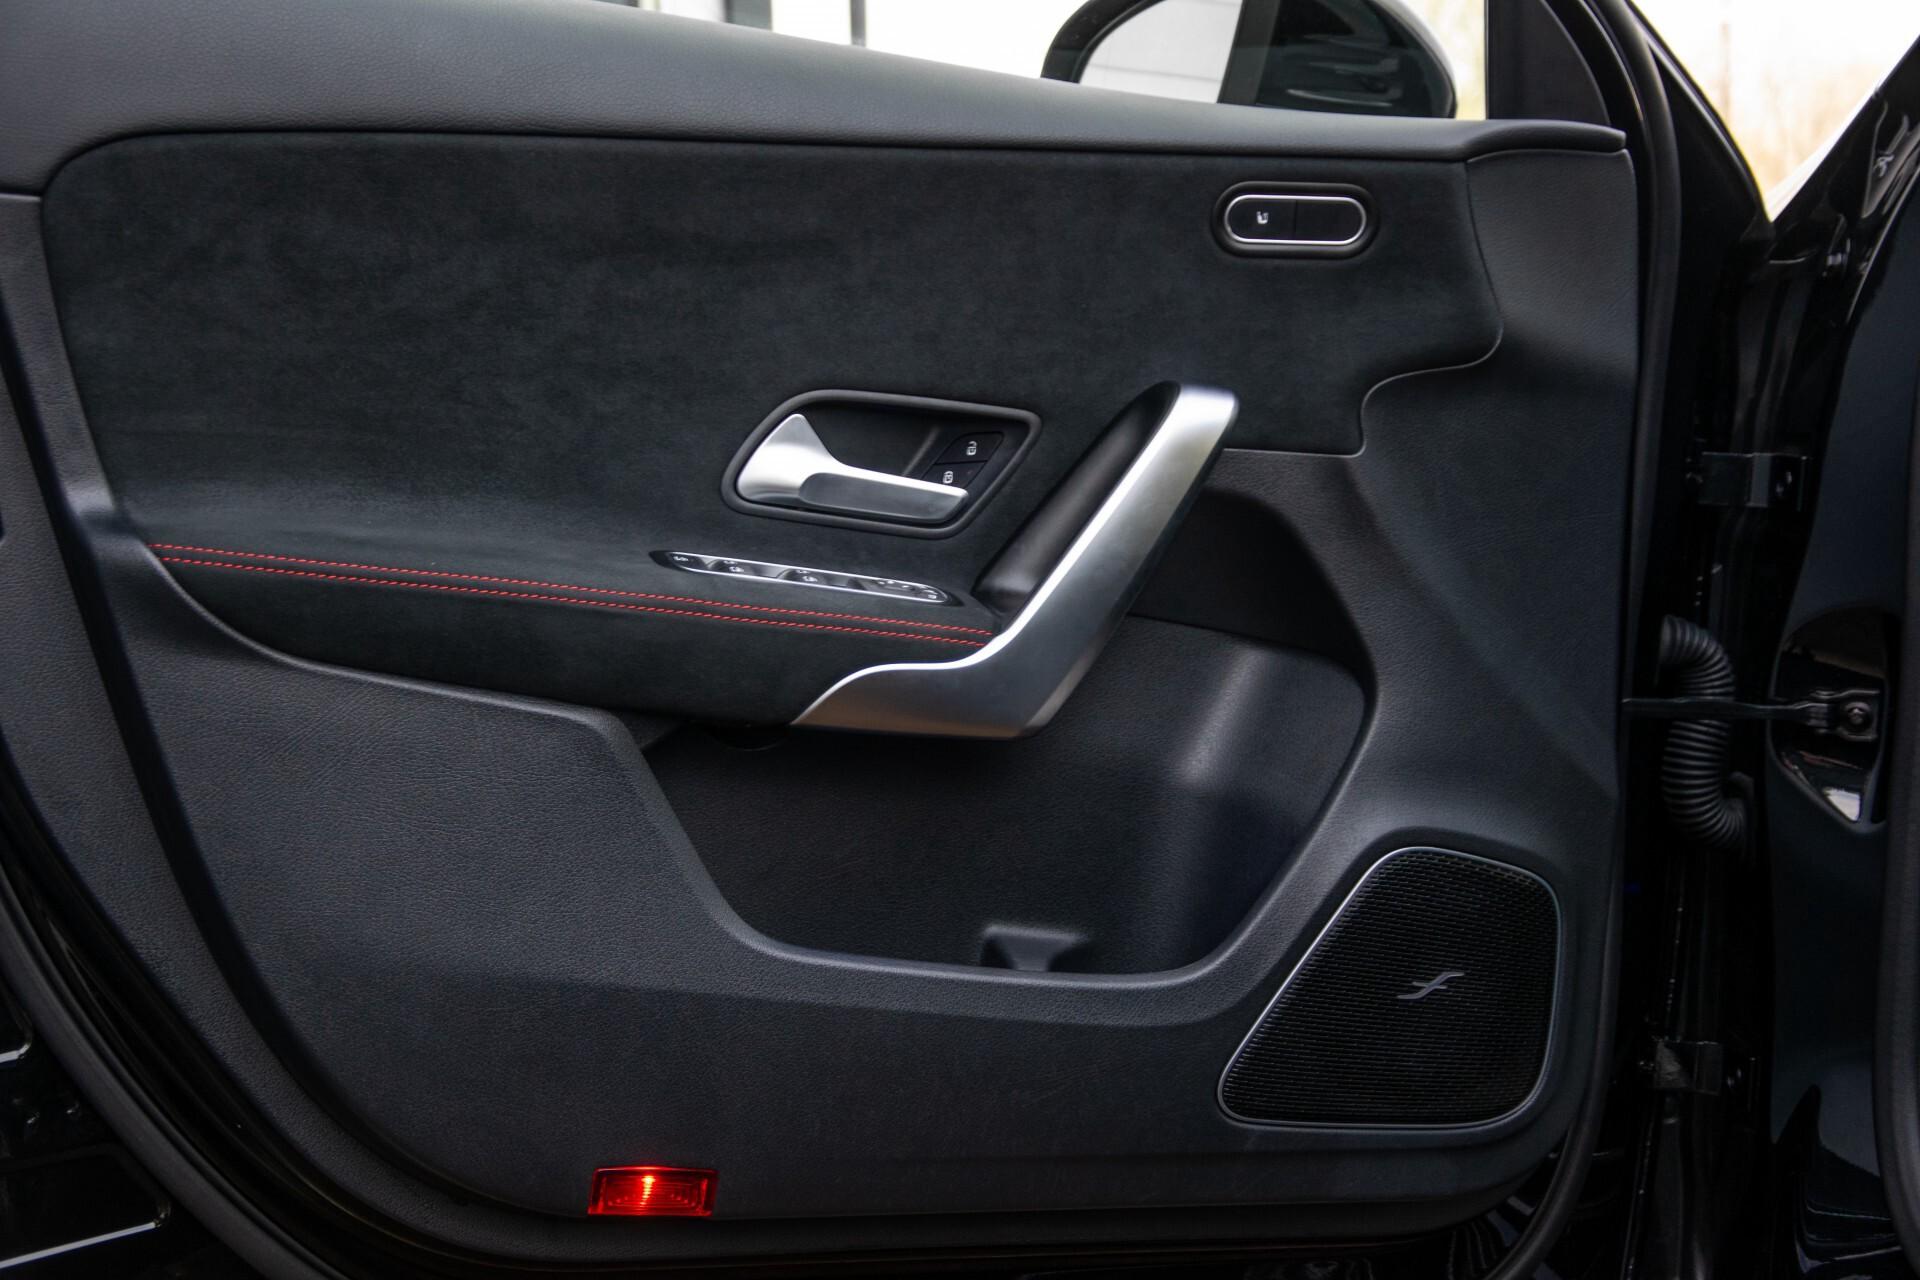 Mercedes-Benz A-Klasse 250 4-M AMG Panorama/Keyless-Entry/MBUX/HUD/Burmester/360/Multibeam LED Aut7 Foto 35